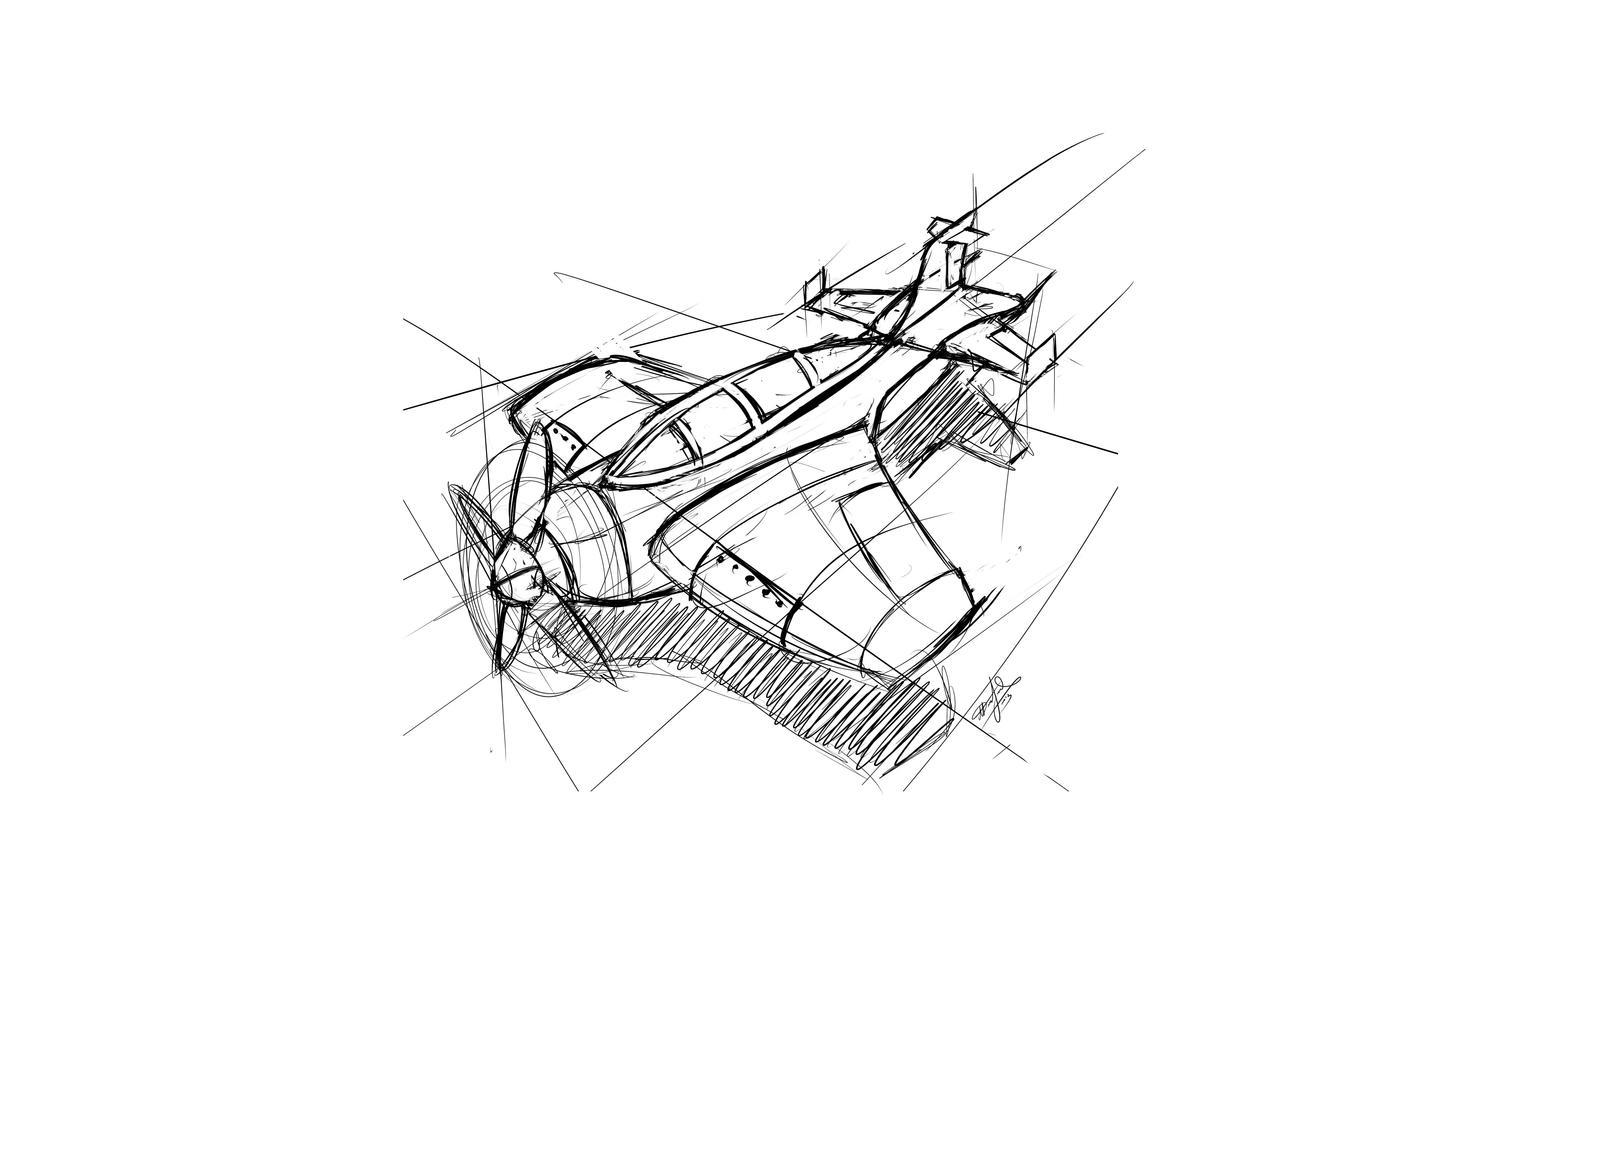 Plane Concept 2 by sao96